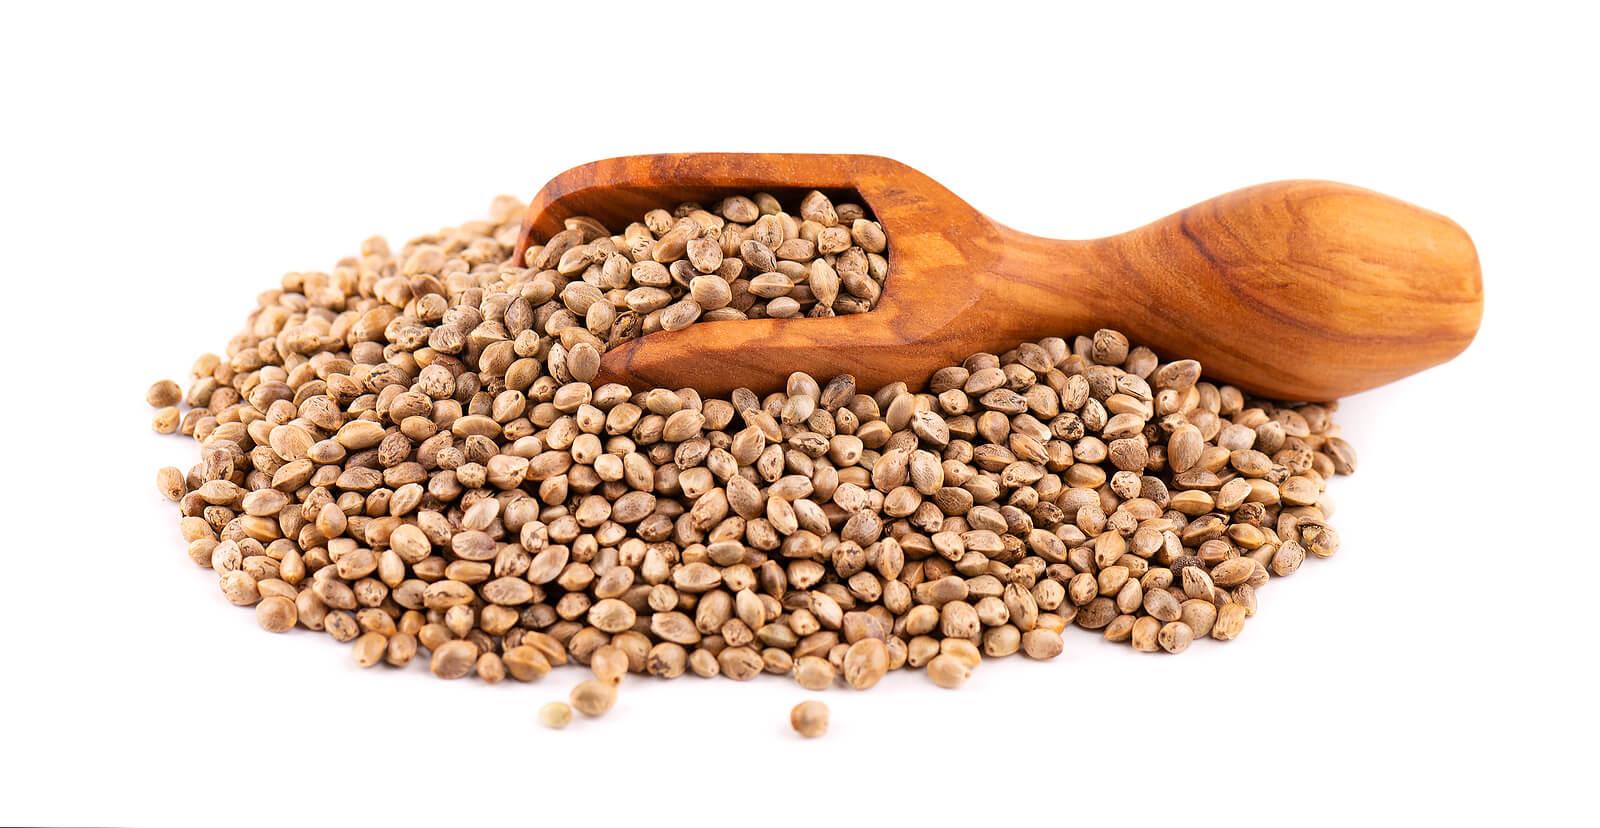 Buy Marijuana Seeds In Canajoharie